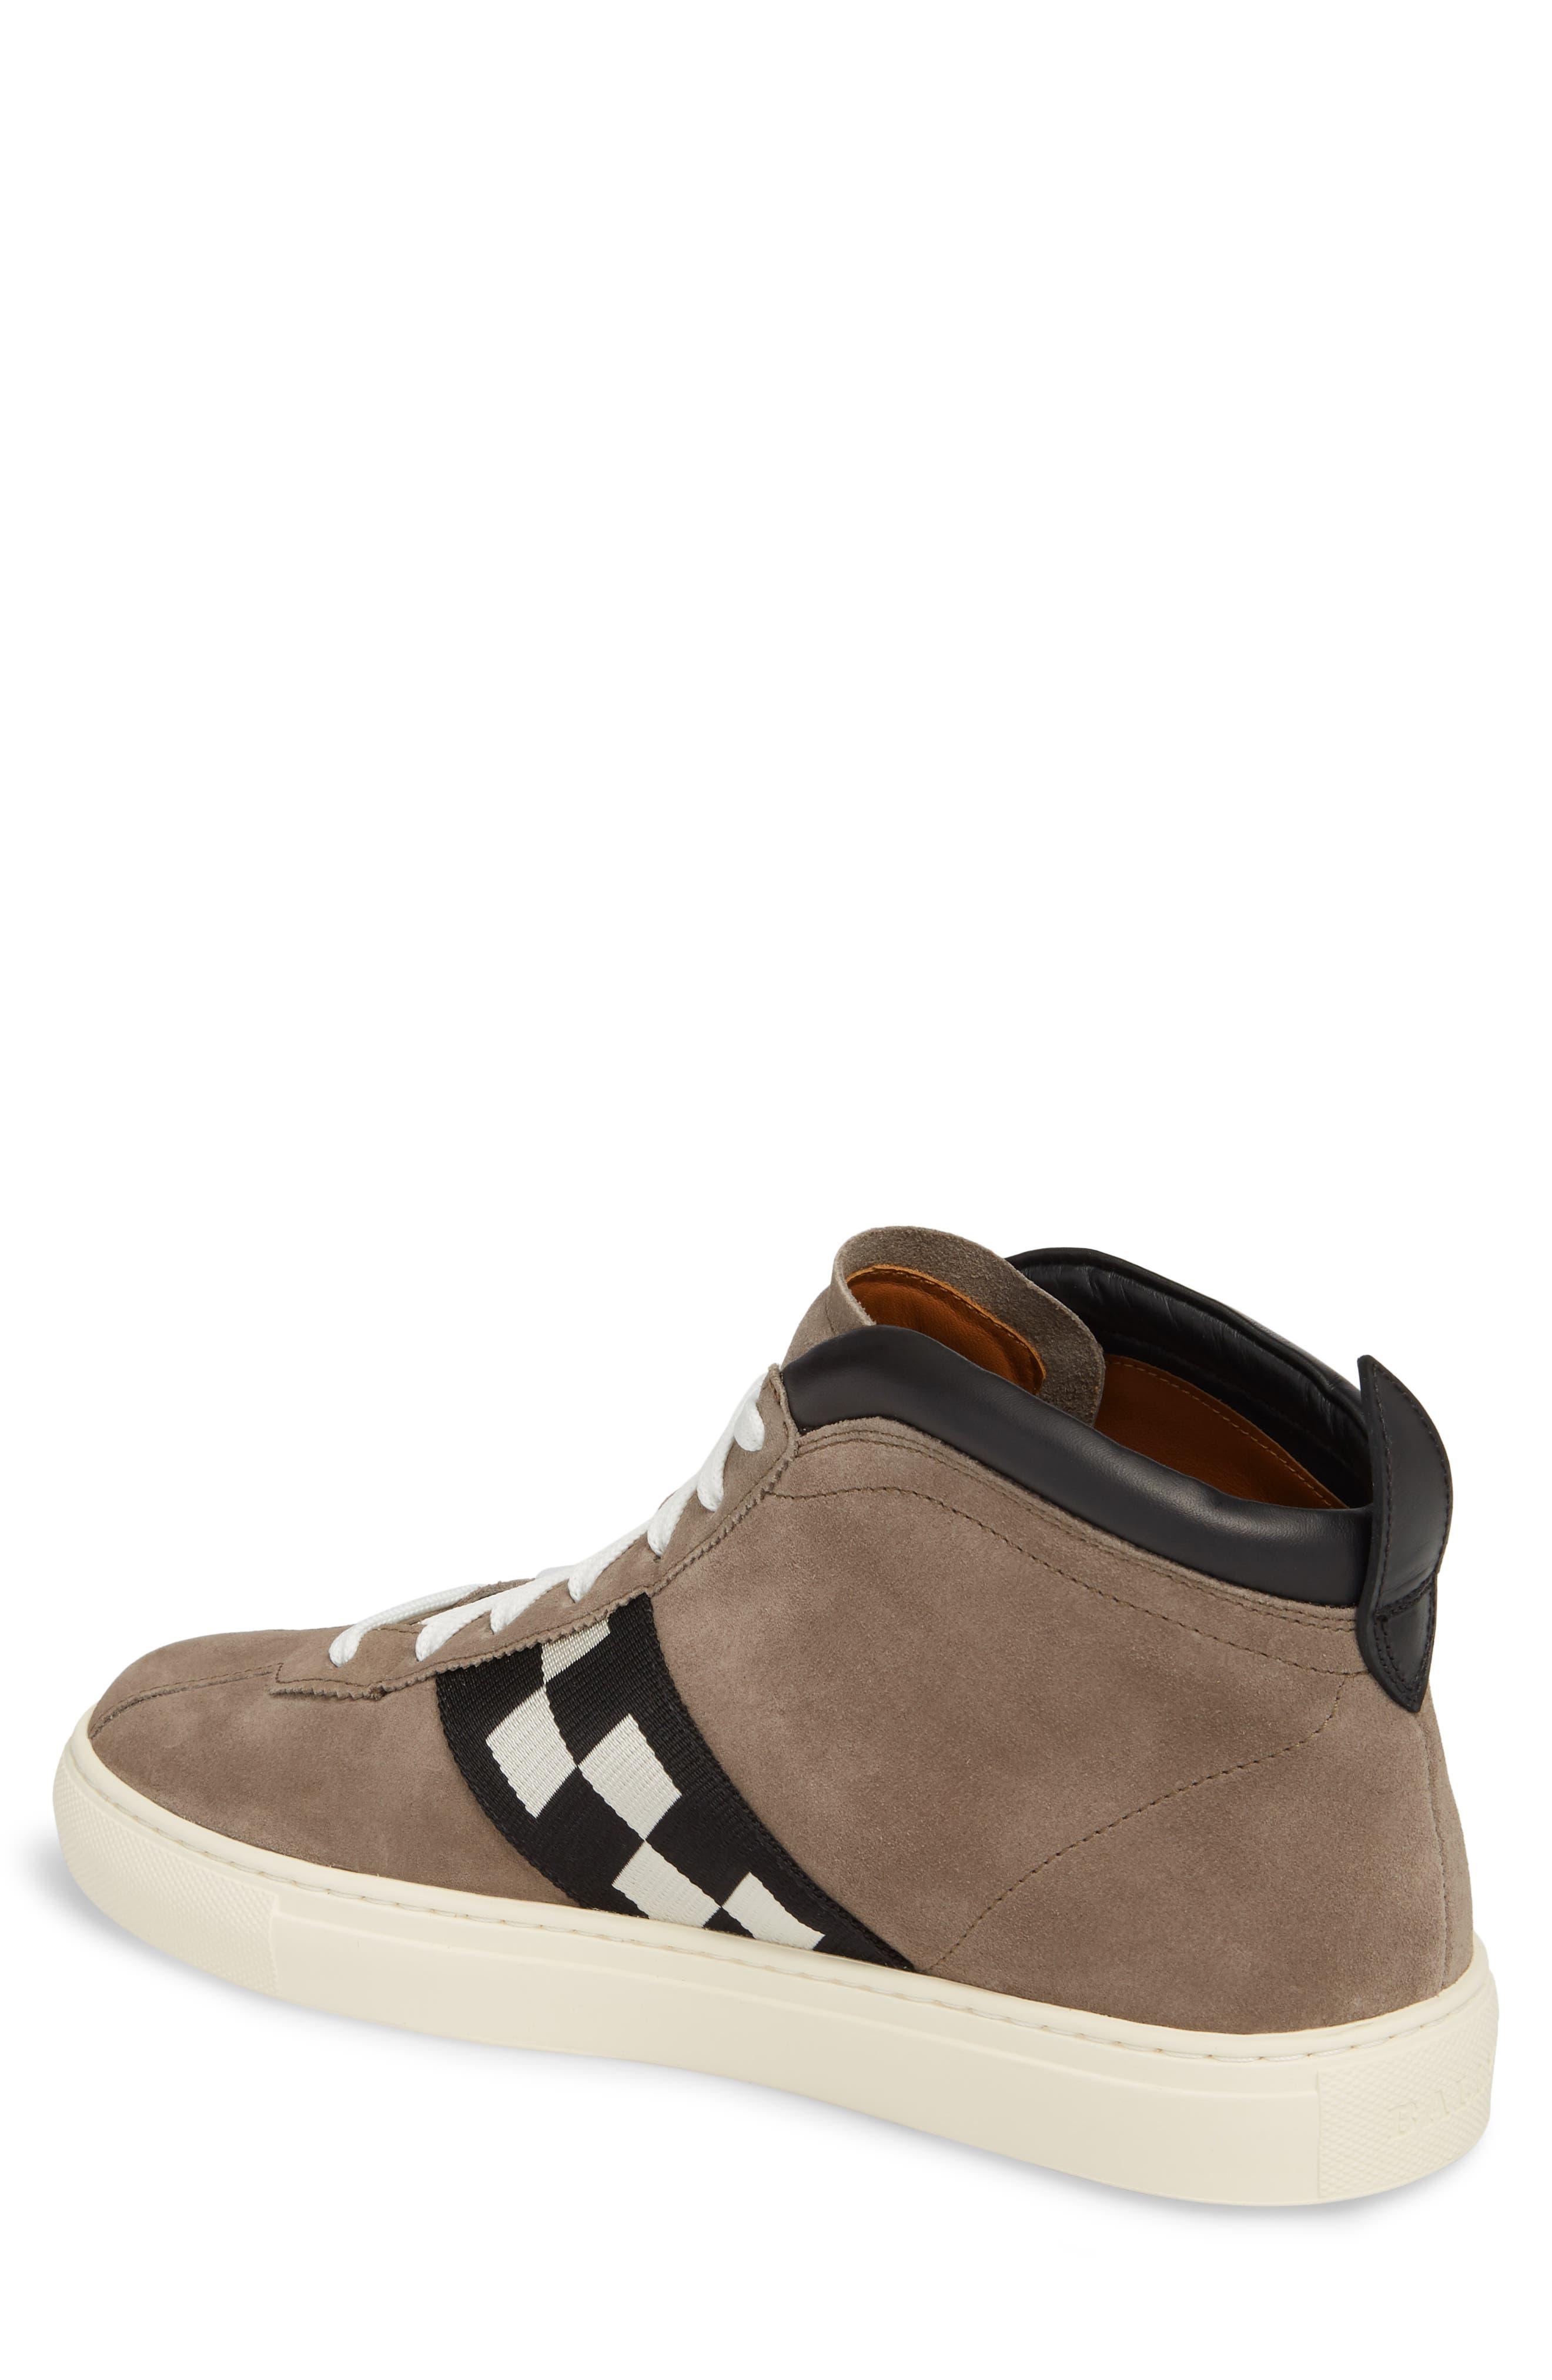 Vita Checkered High Top Sneaker,                             Alternate thumbnail 2, color,                             Snuff